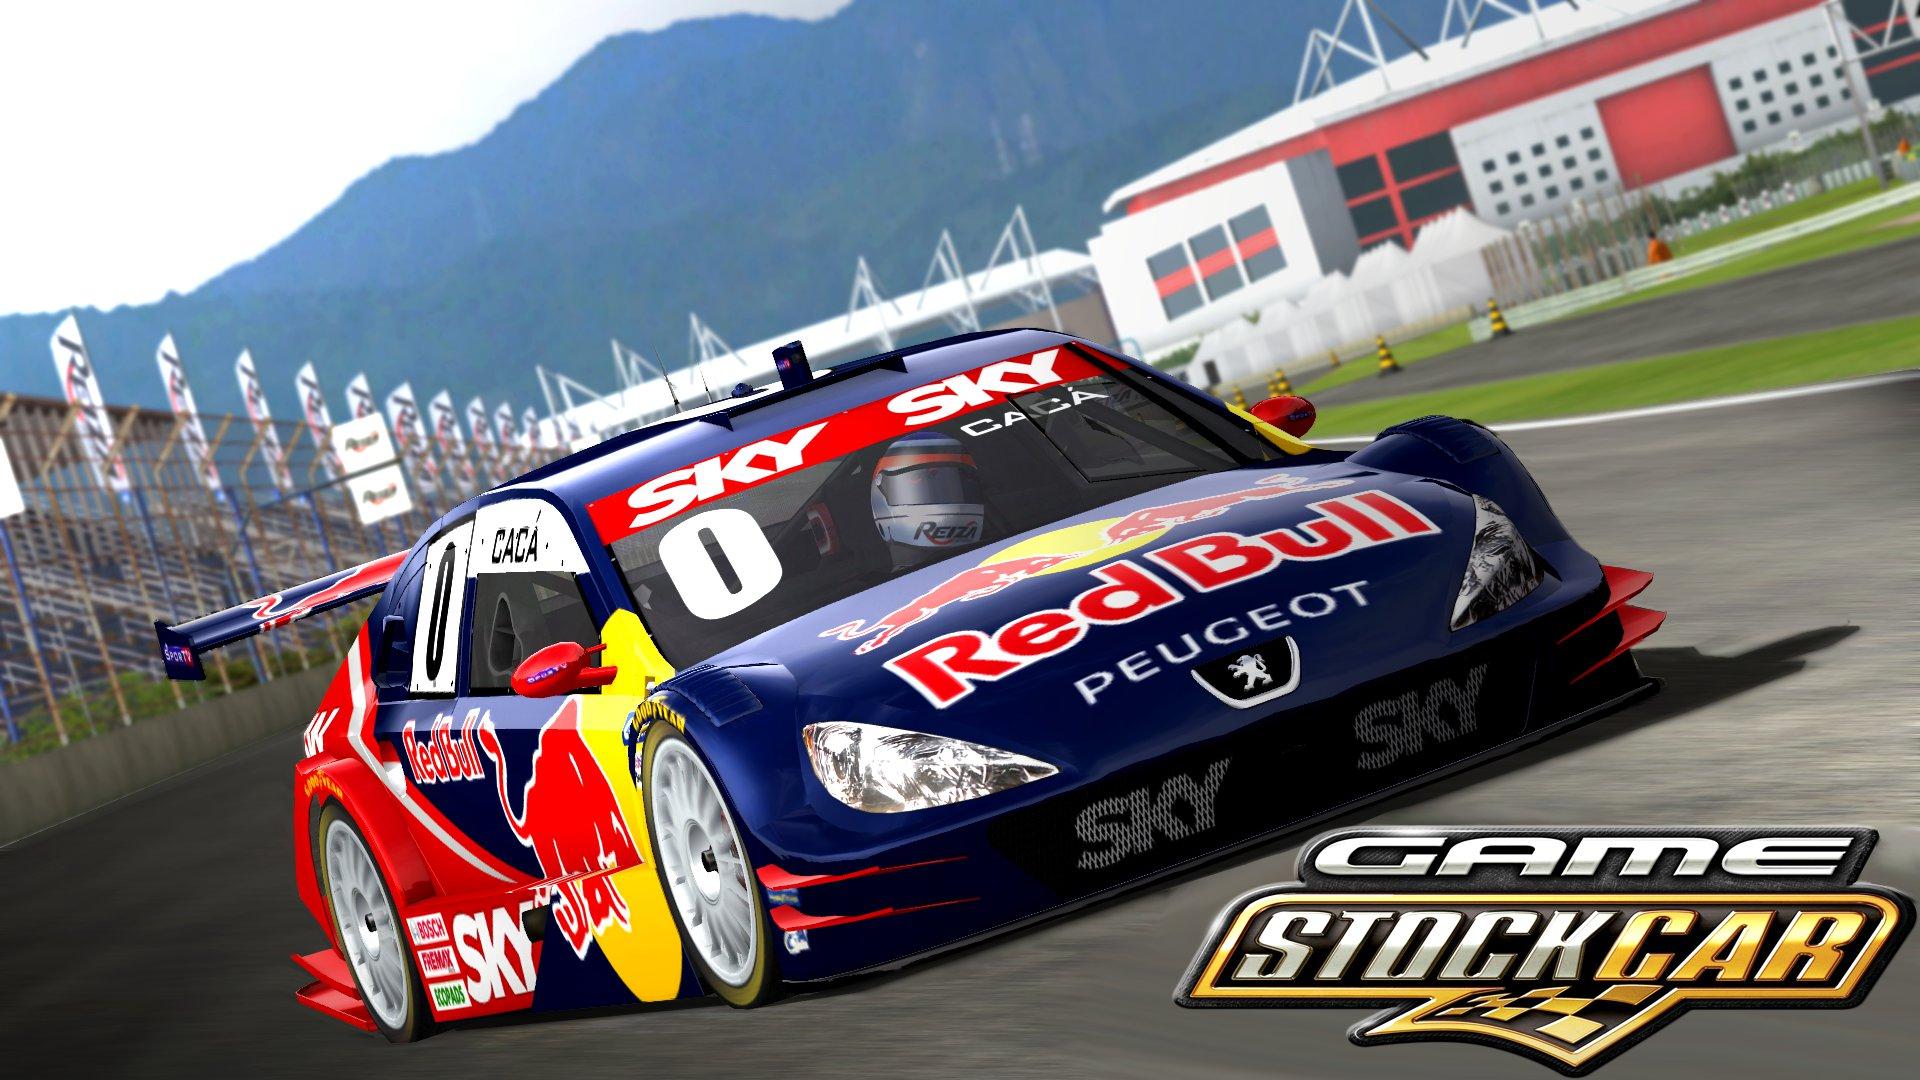 Game Stock Car By Reiza Studios Announced Virtualr Net